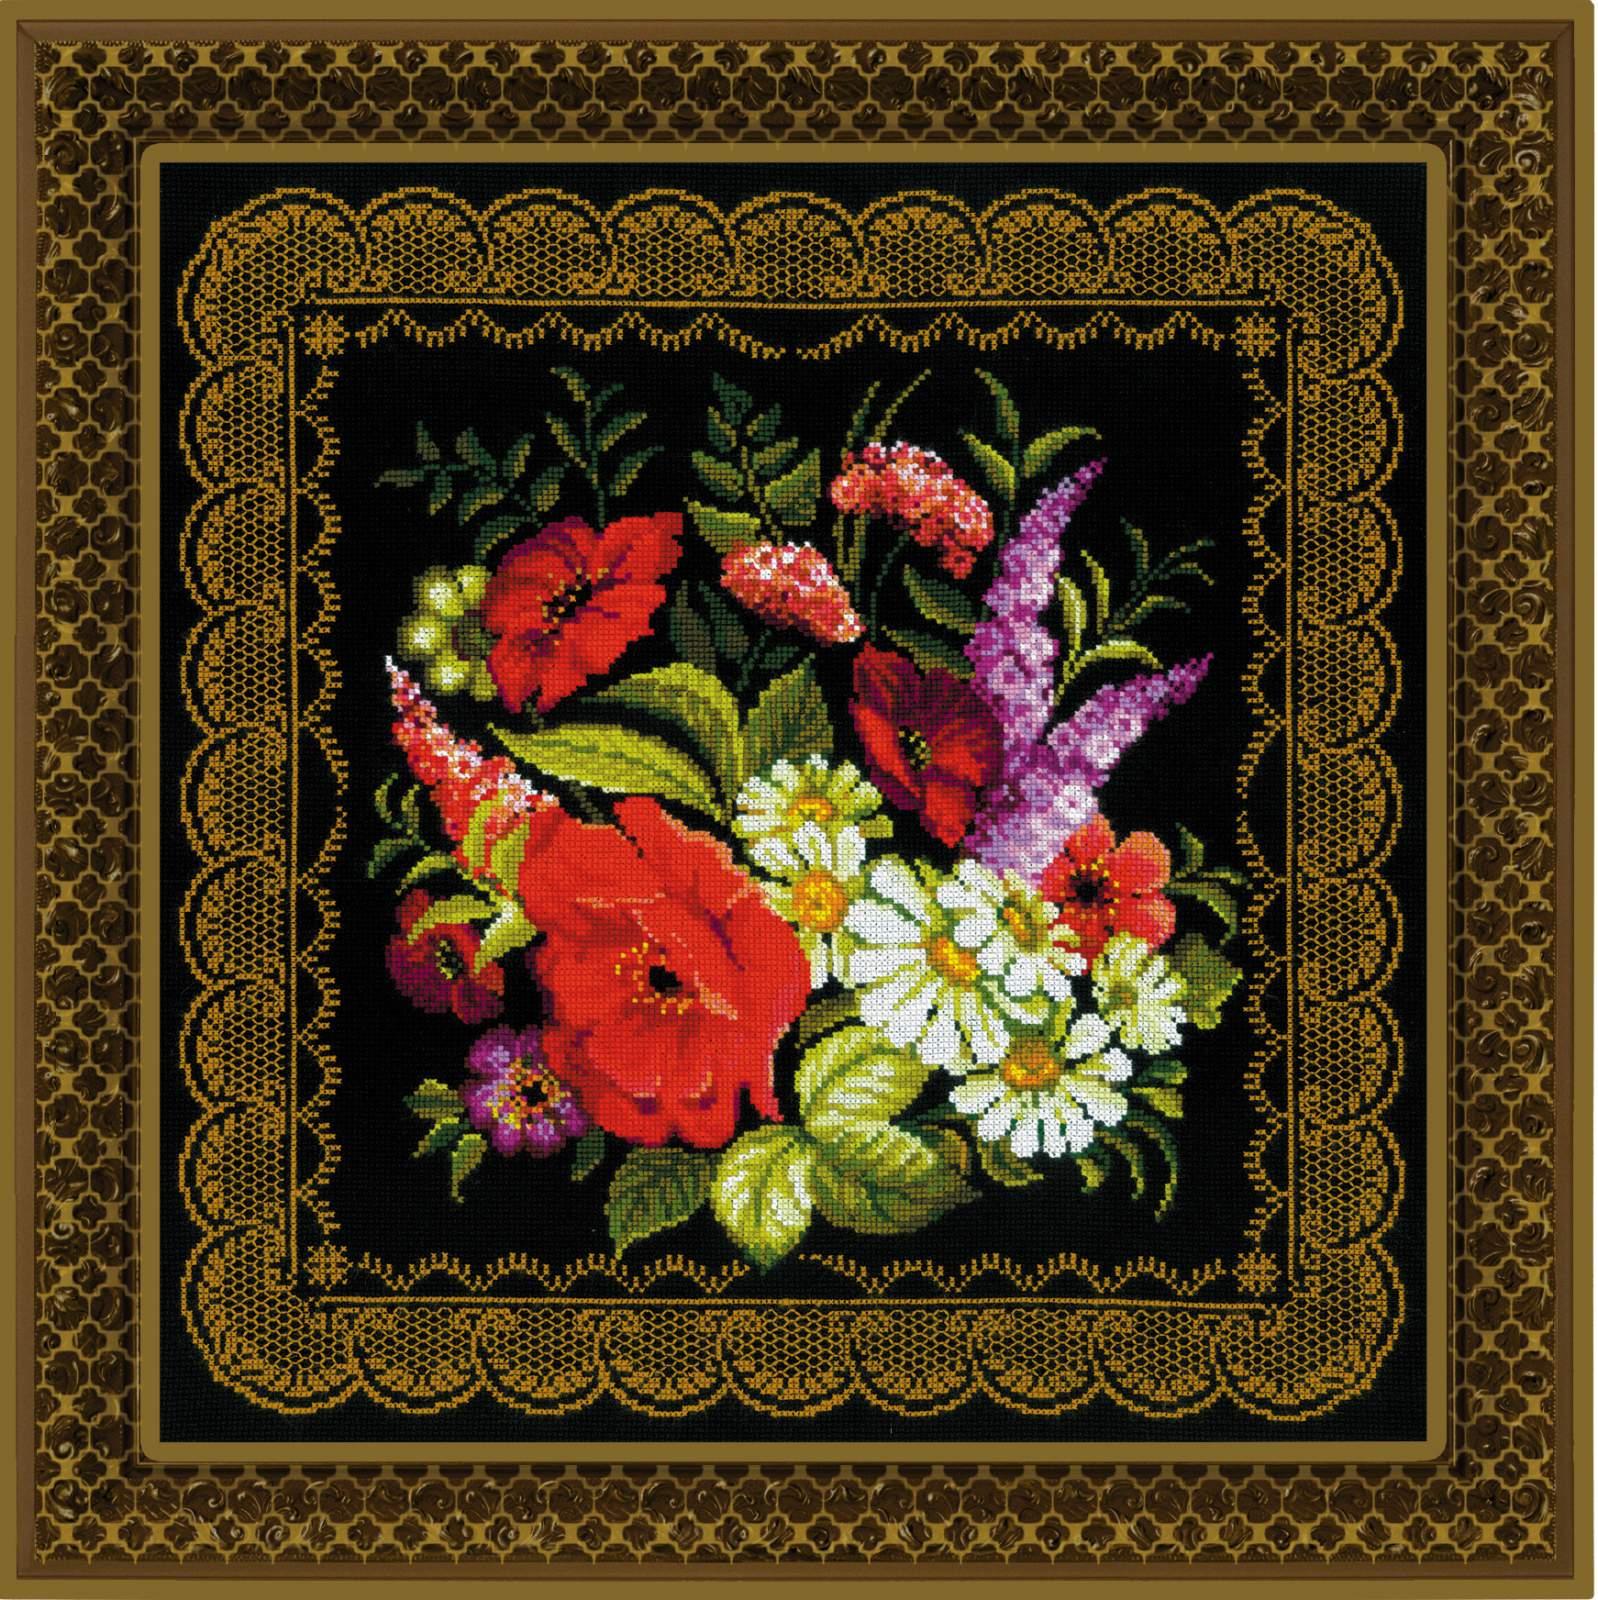 Вышивка риолис подушки каталог